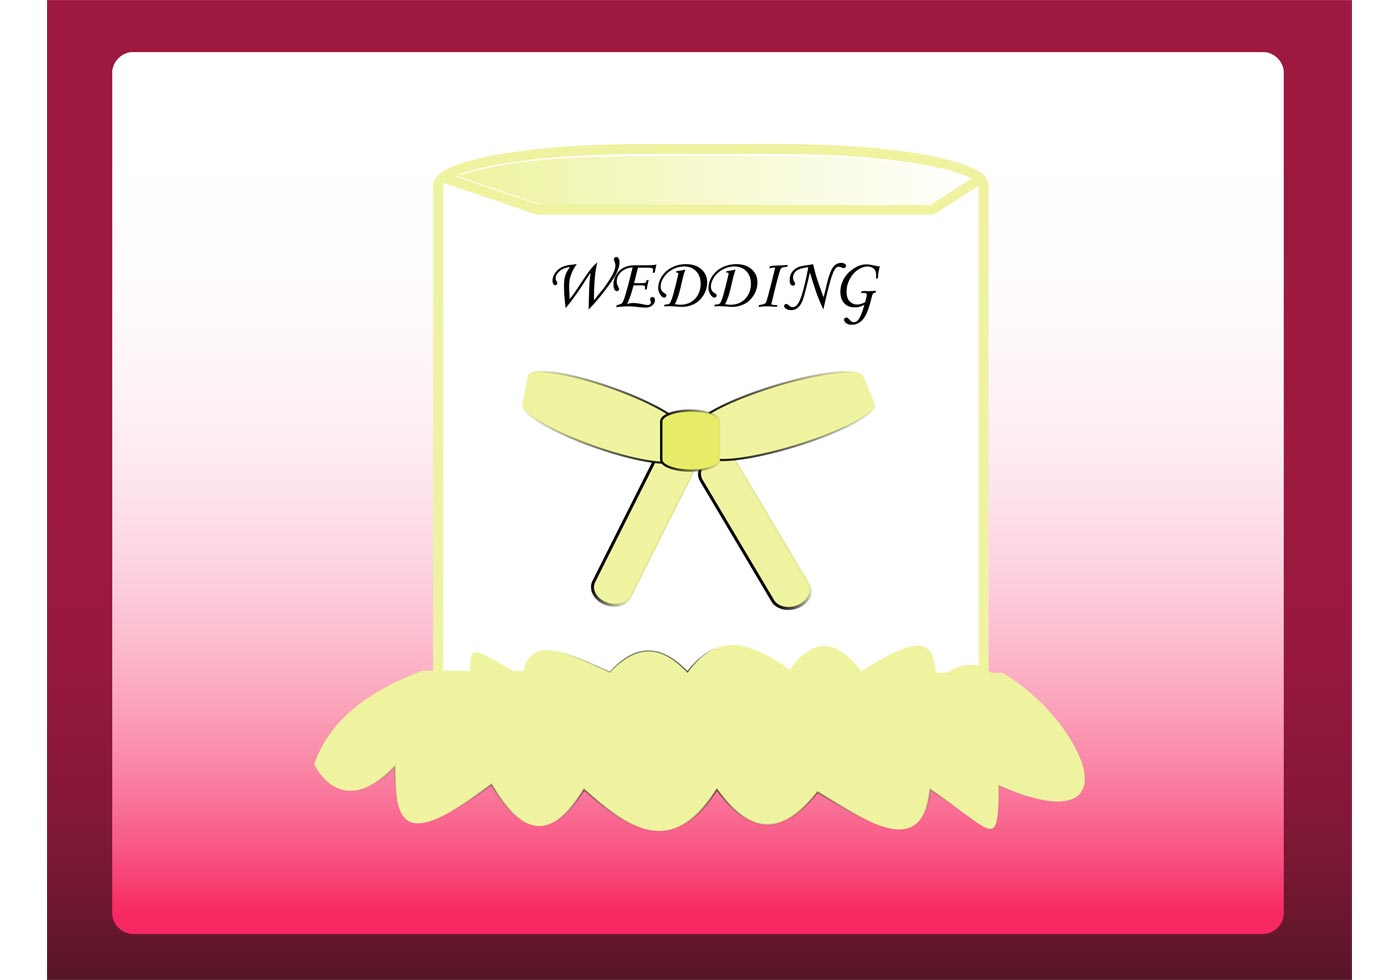 Wedding Free Vector Art 1883 Free Downloads